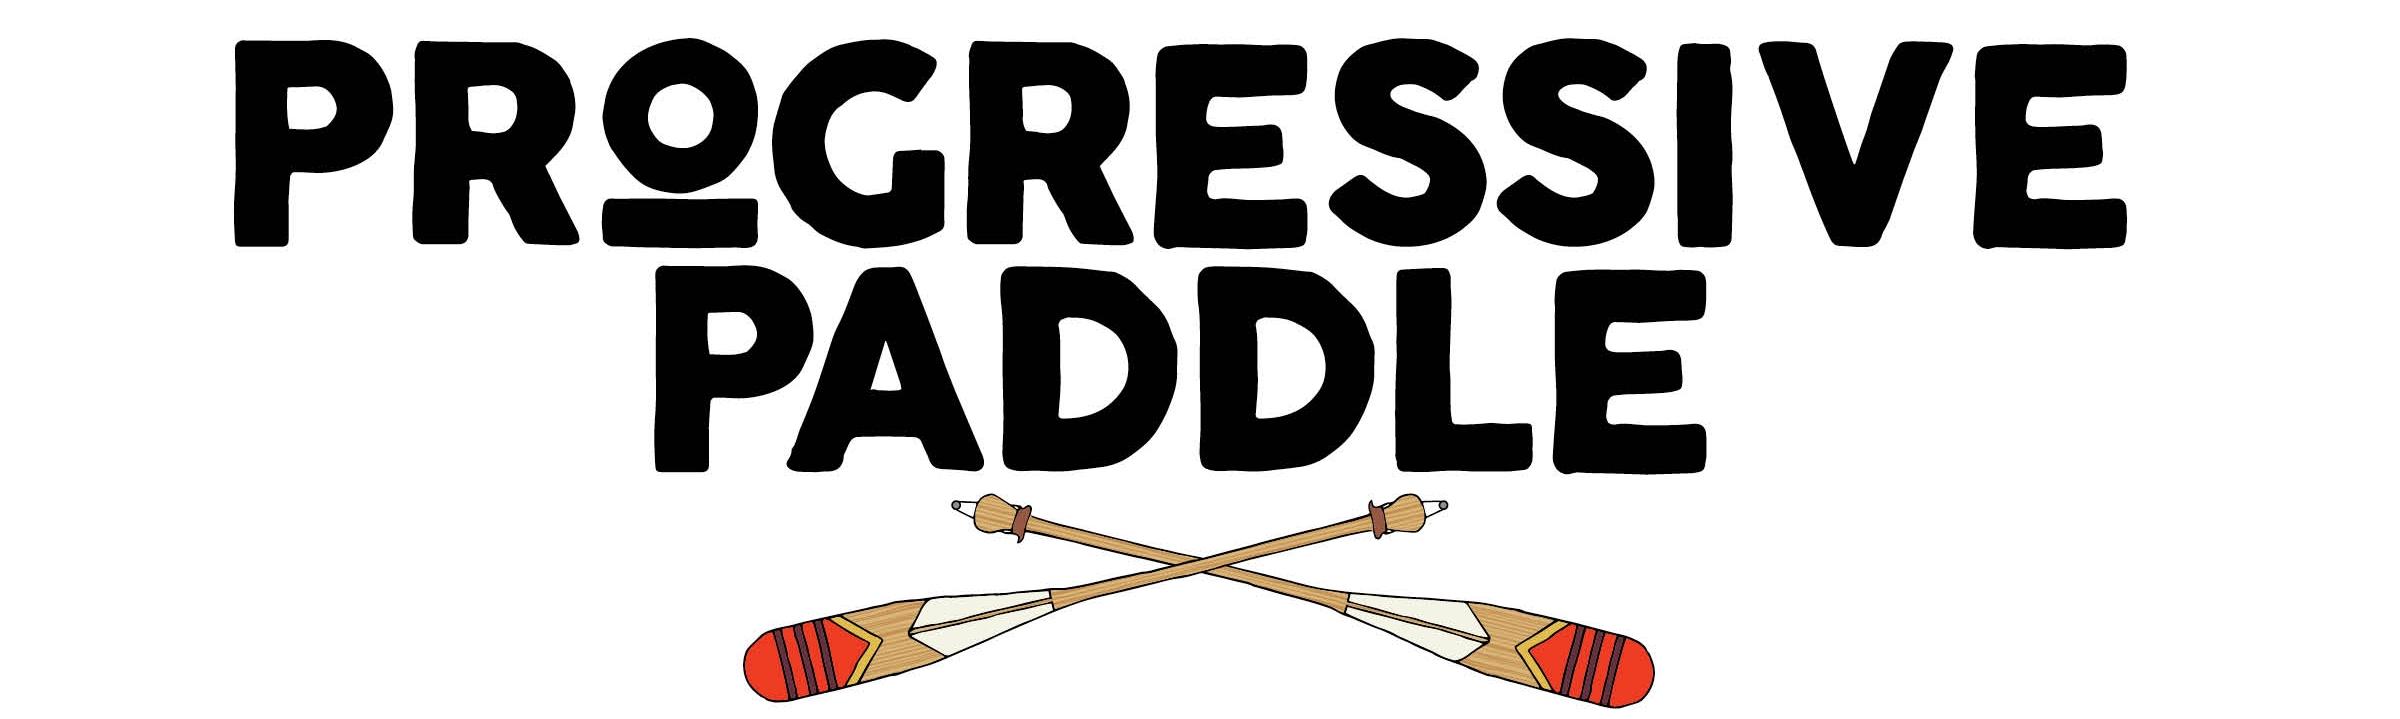 progressive paddle.jpg